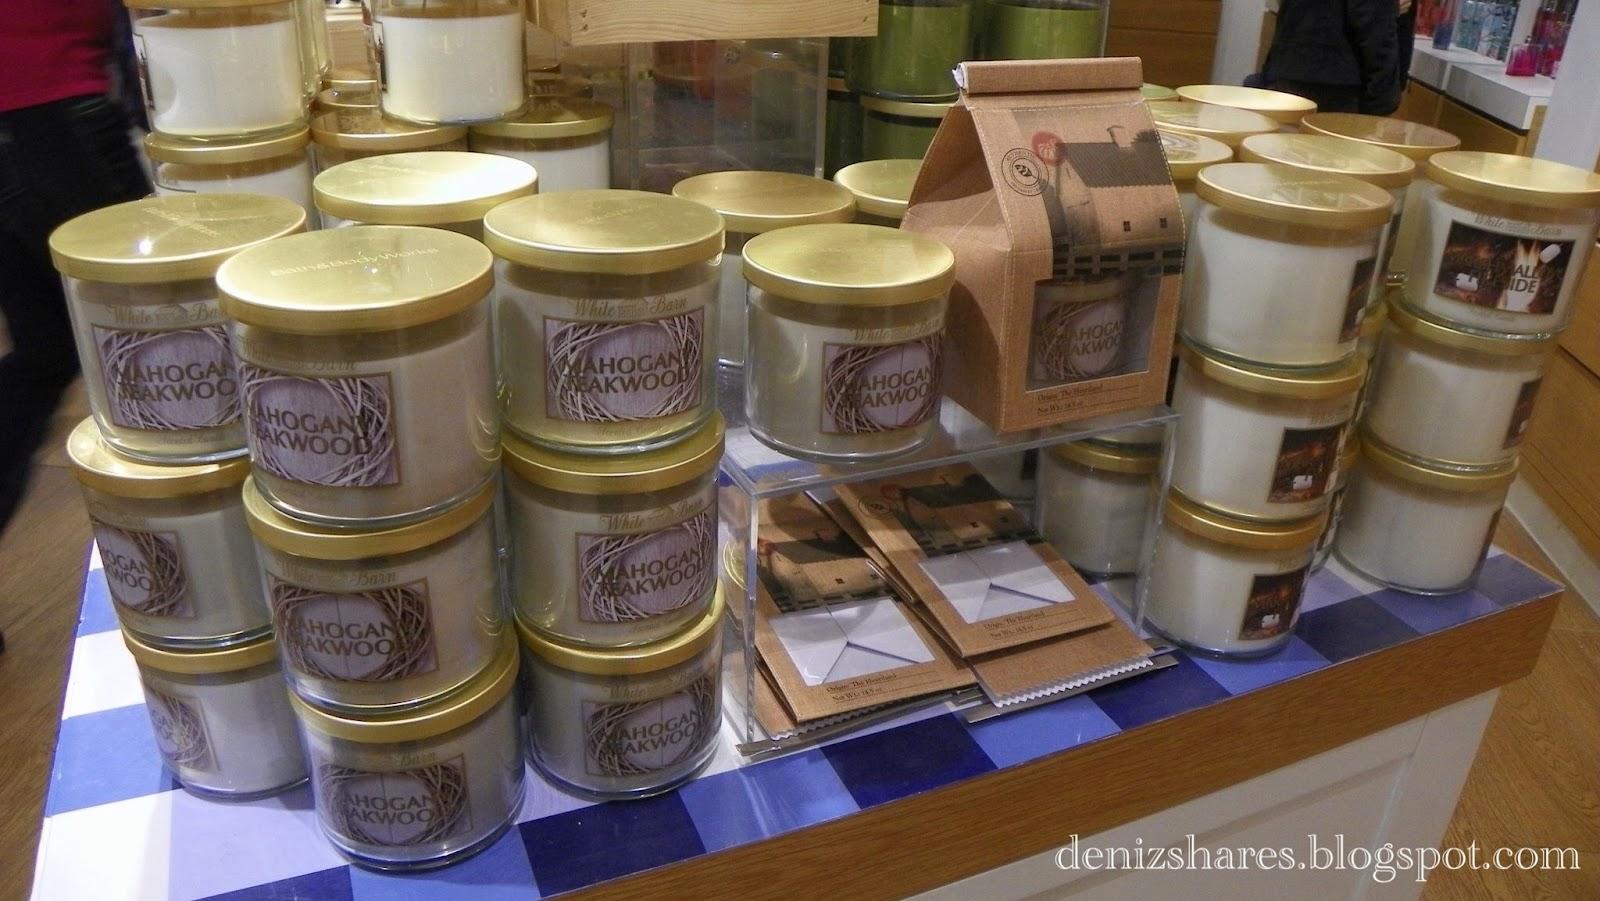 Deniz Shares Bath Amp Body Works Candle Haul Bath Amp Body